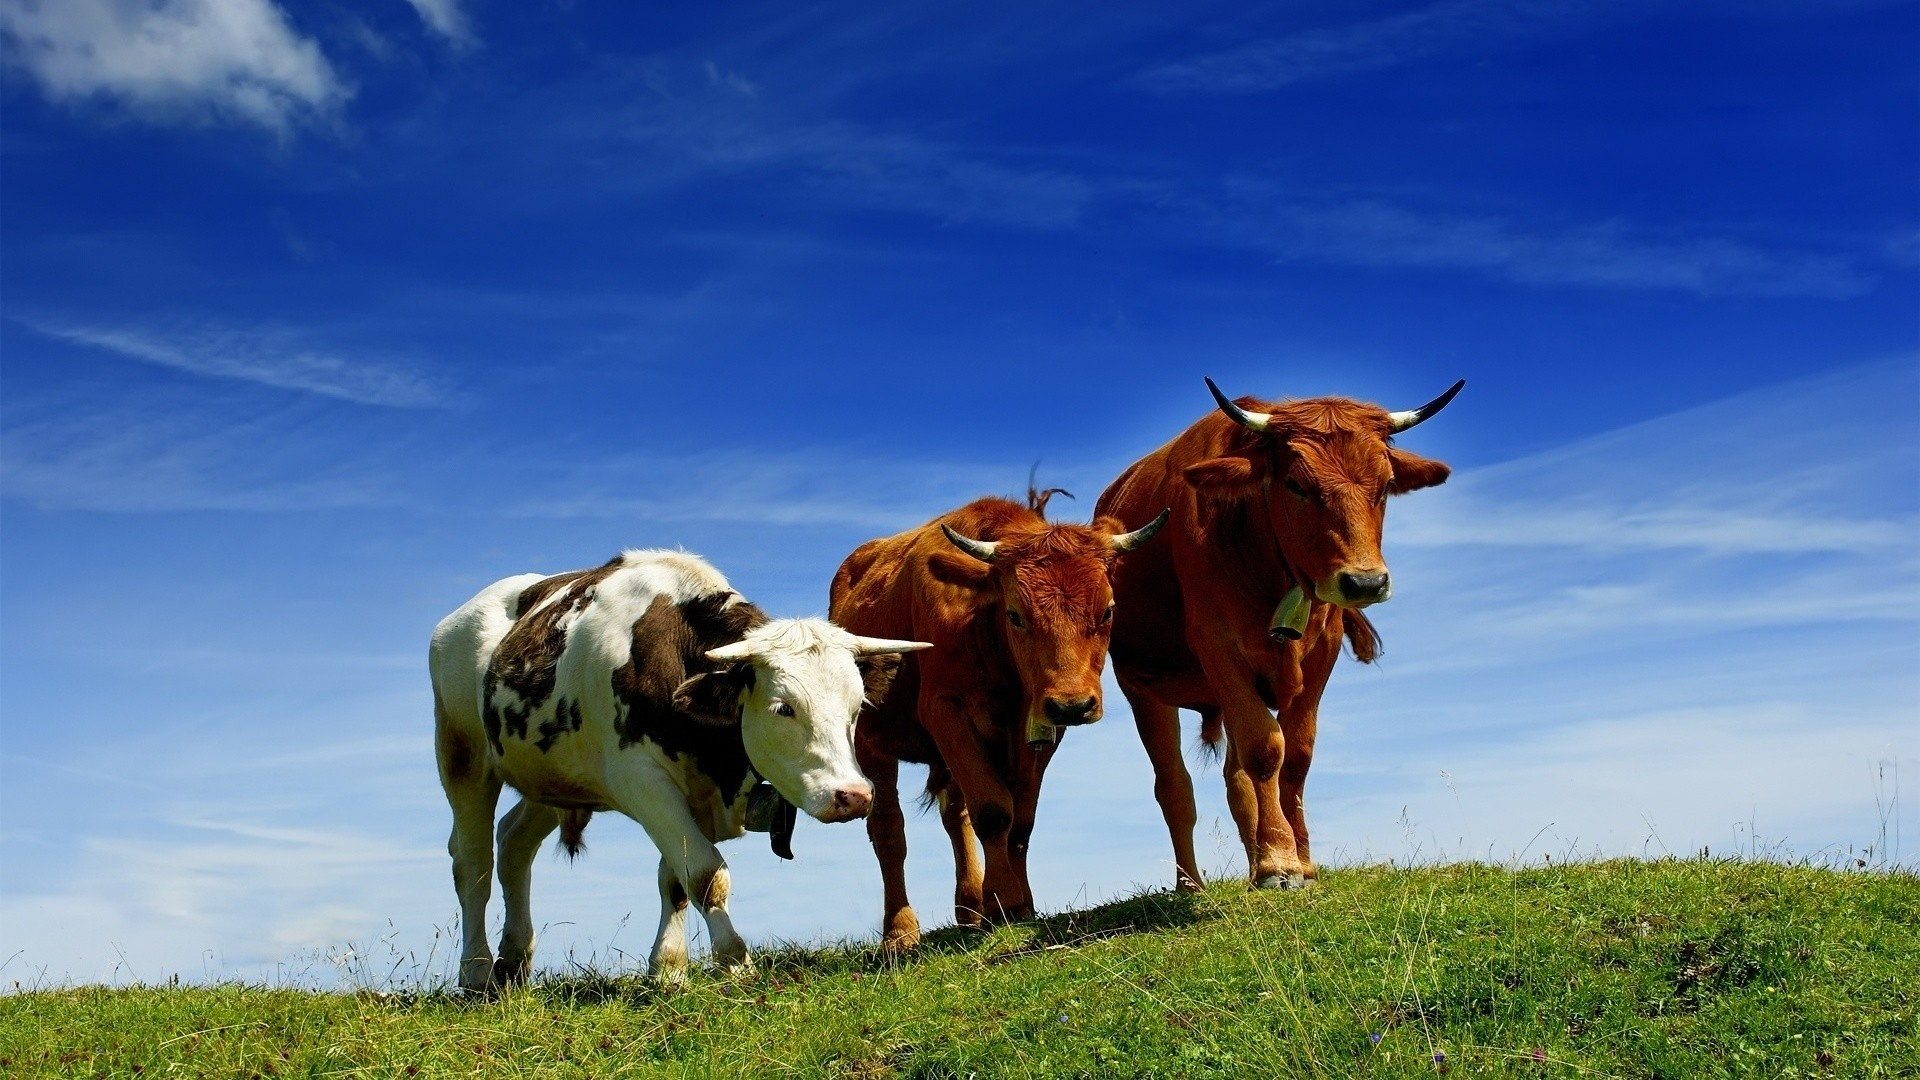 Cow wallpaper photo hd